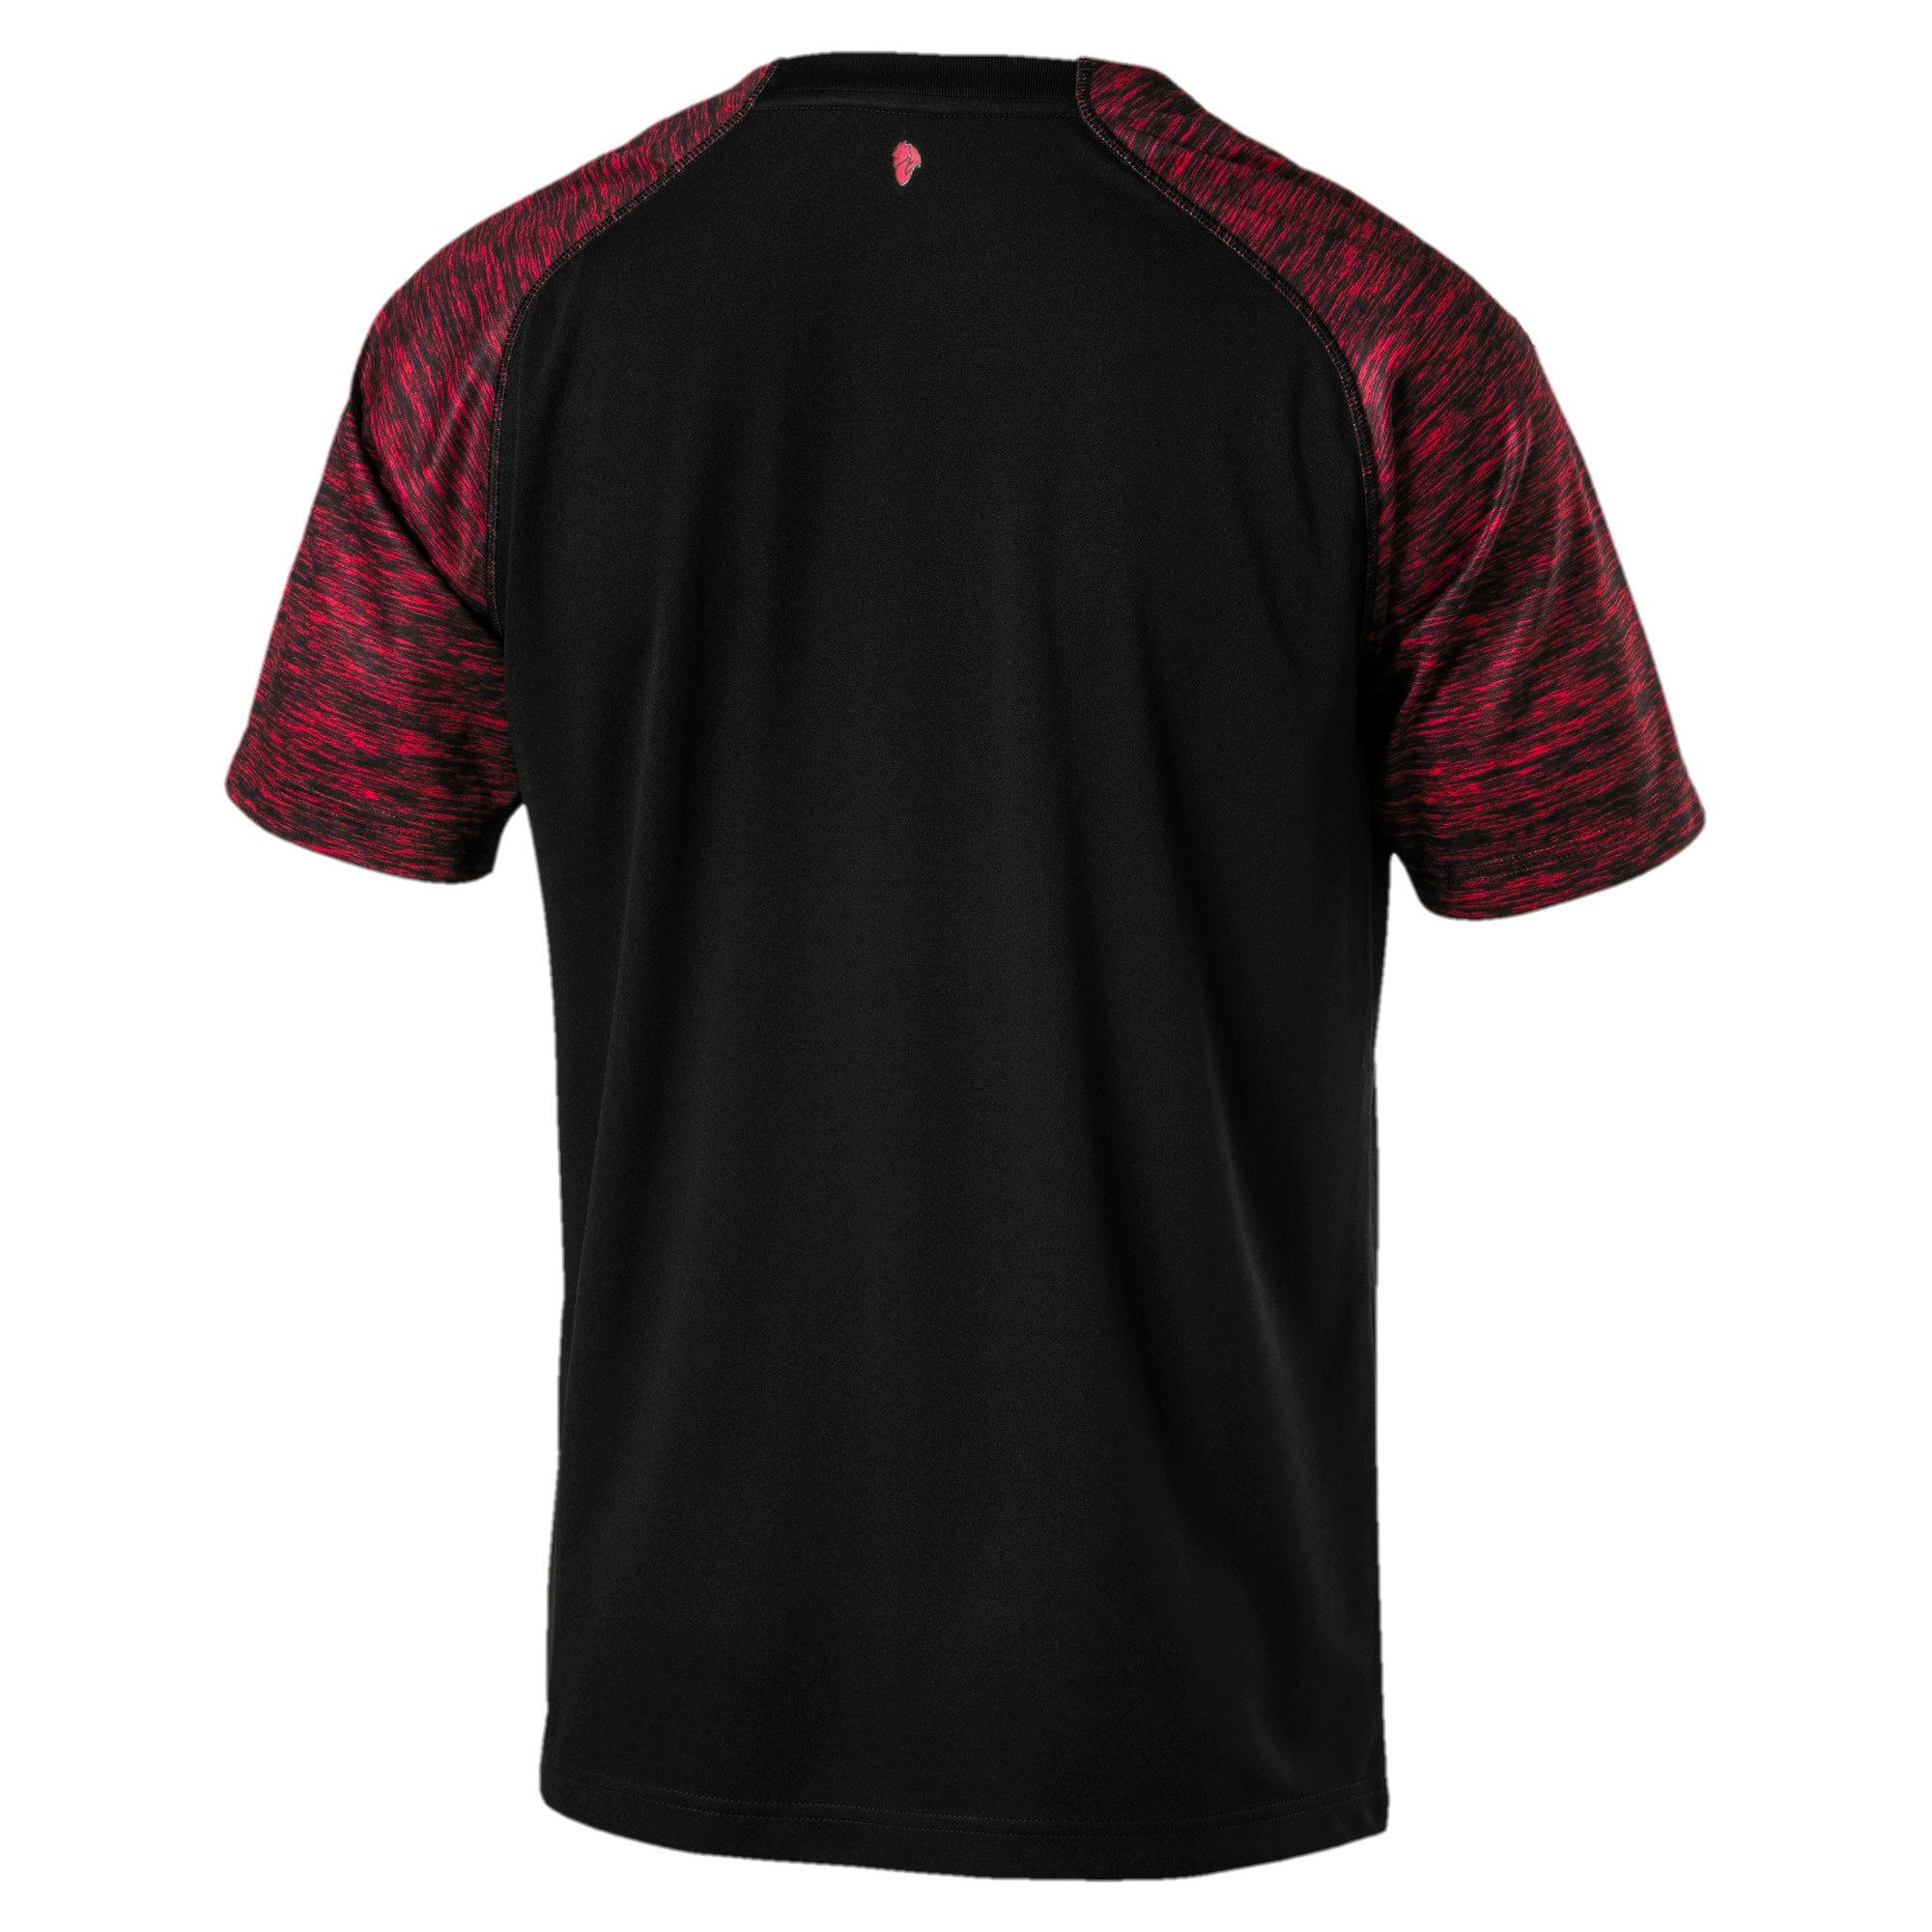 Thumbnail 3 of AC Milan Men's Replica Third Shirt, Puma Black-Tango Red, medium